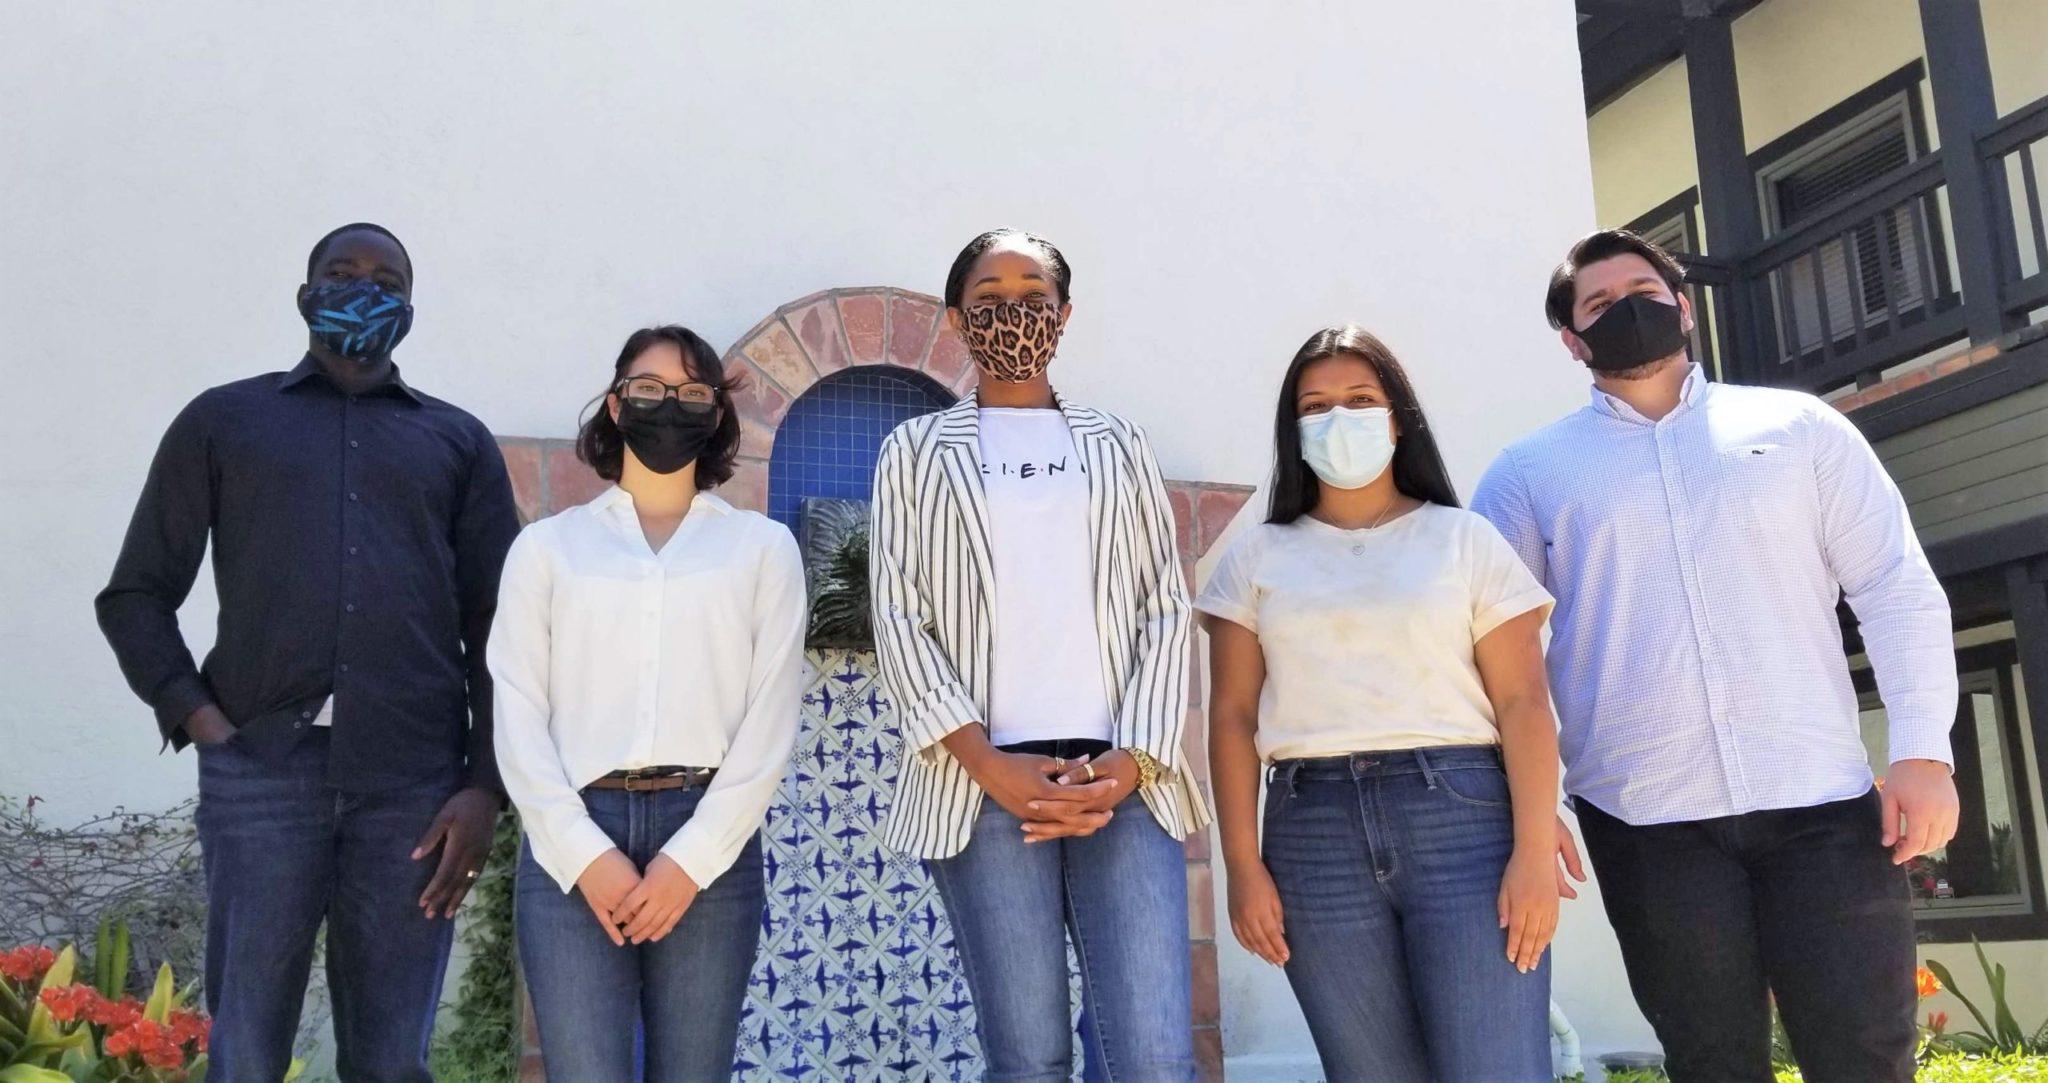 The 2020 cohort of Community Finance Fellows: Benson Ochira, Essence Rodriguez, Louise Jordan, Crystal Sevilla, Andrew Moncada